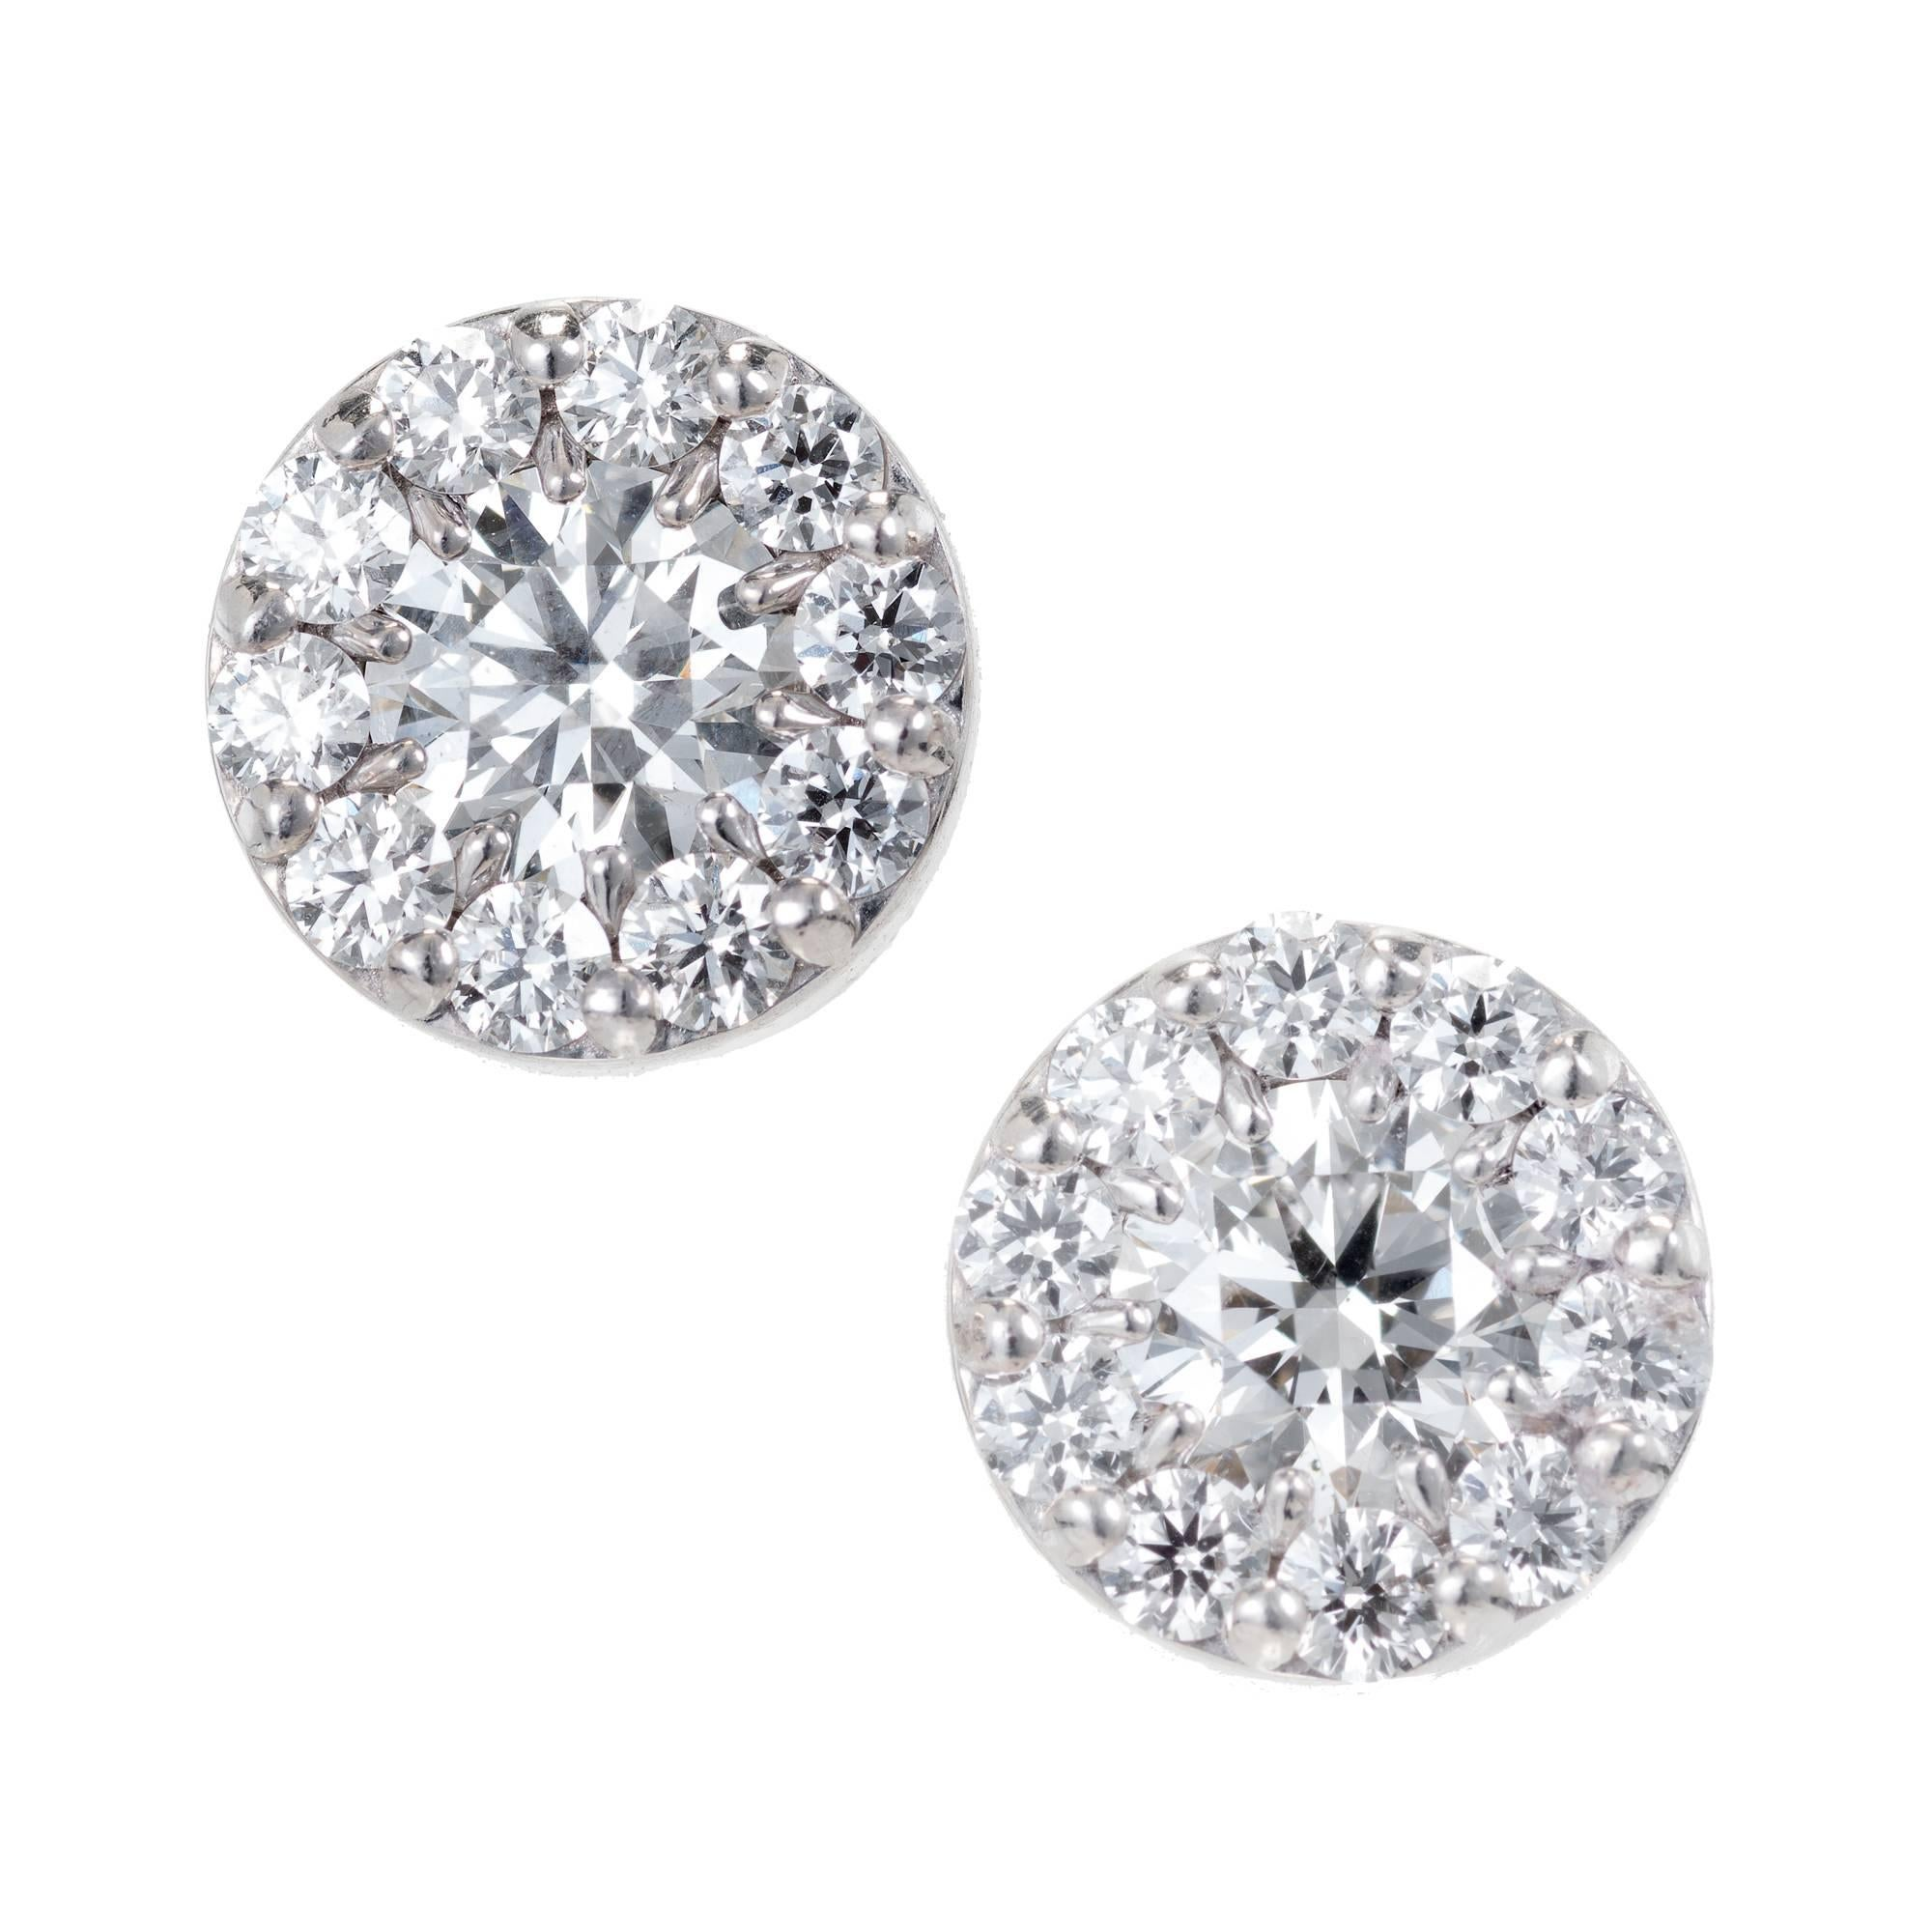 1.00 Carat Diamond Gold Halo Round Cluster Stud Earrings